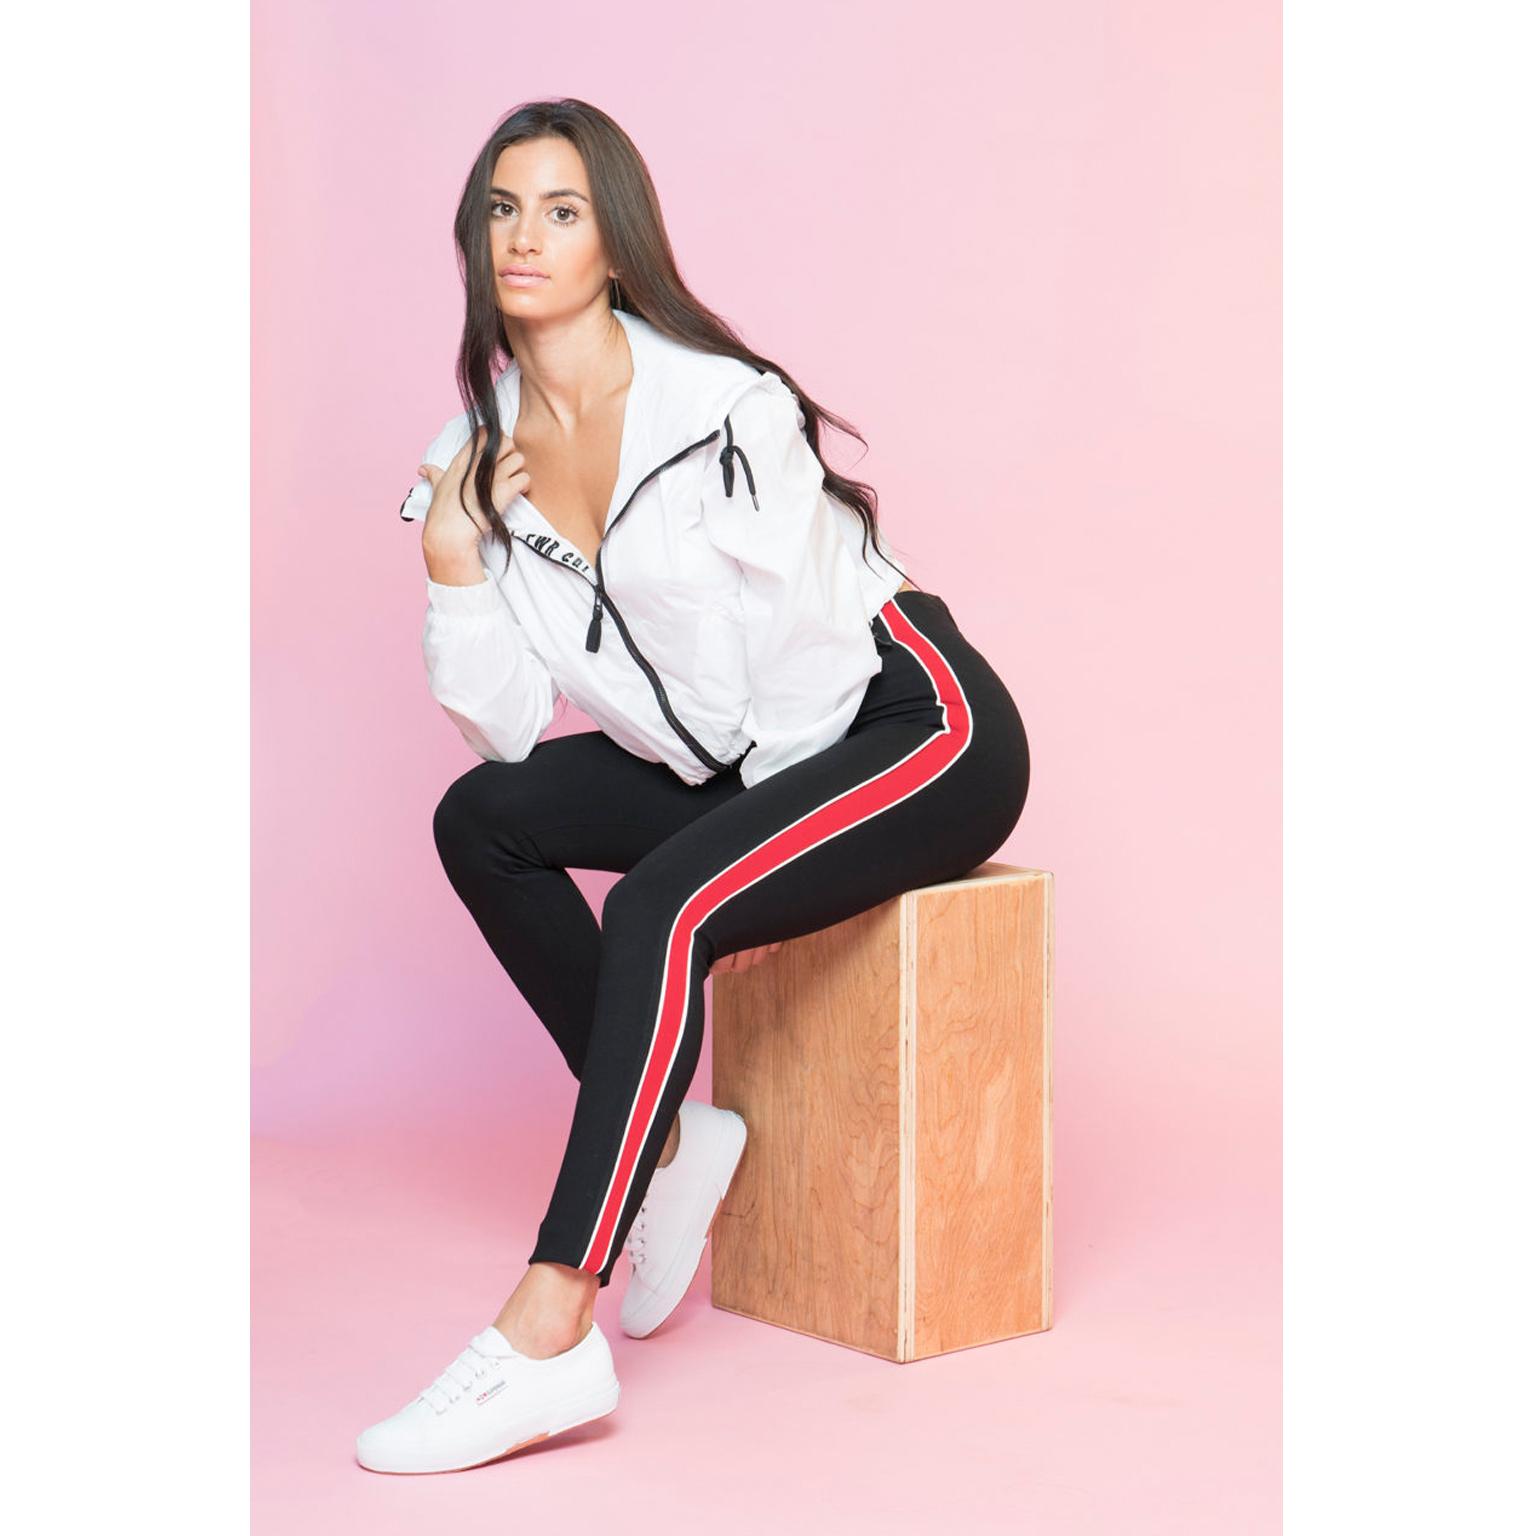 Toronto-Fitness-Model-Agency-Fashion-Commercial-Portrait-Elizabeth-Ruffolo